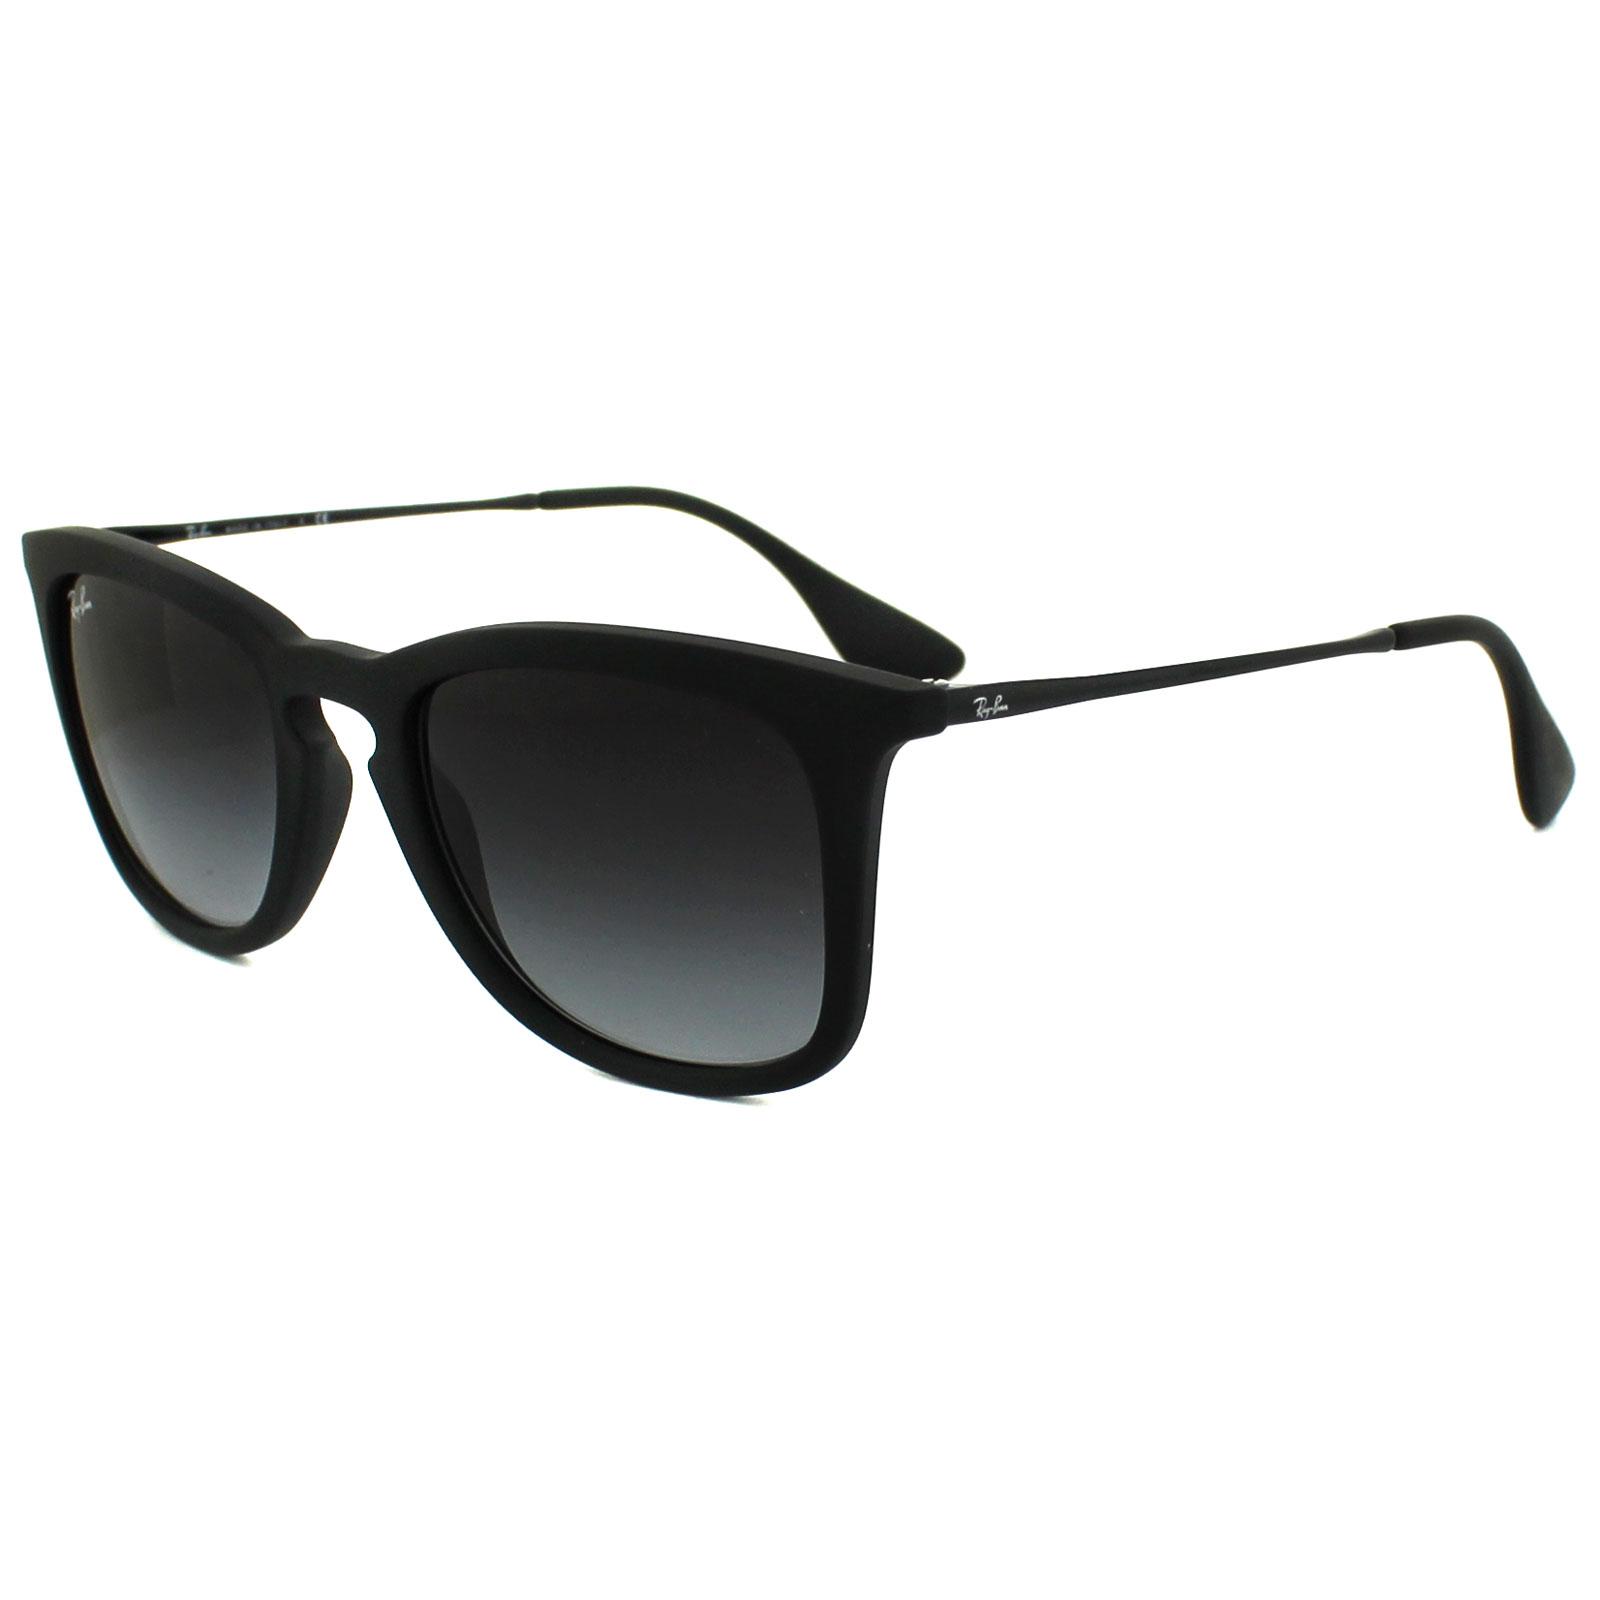 b4385a64524 Sentinel Ray-Ban Sunglasses 4221 622 8G Black Rubber Grey Gradient